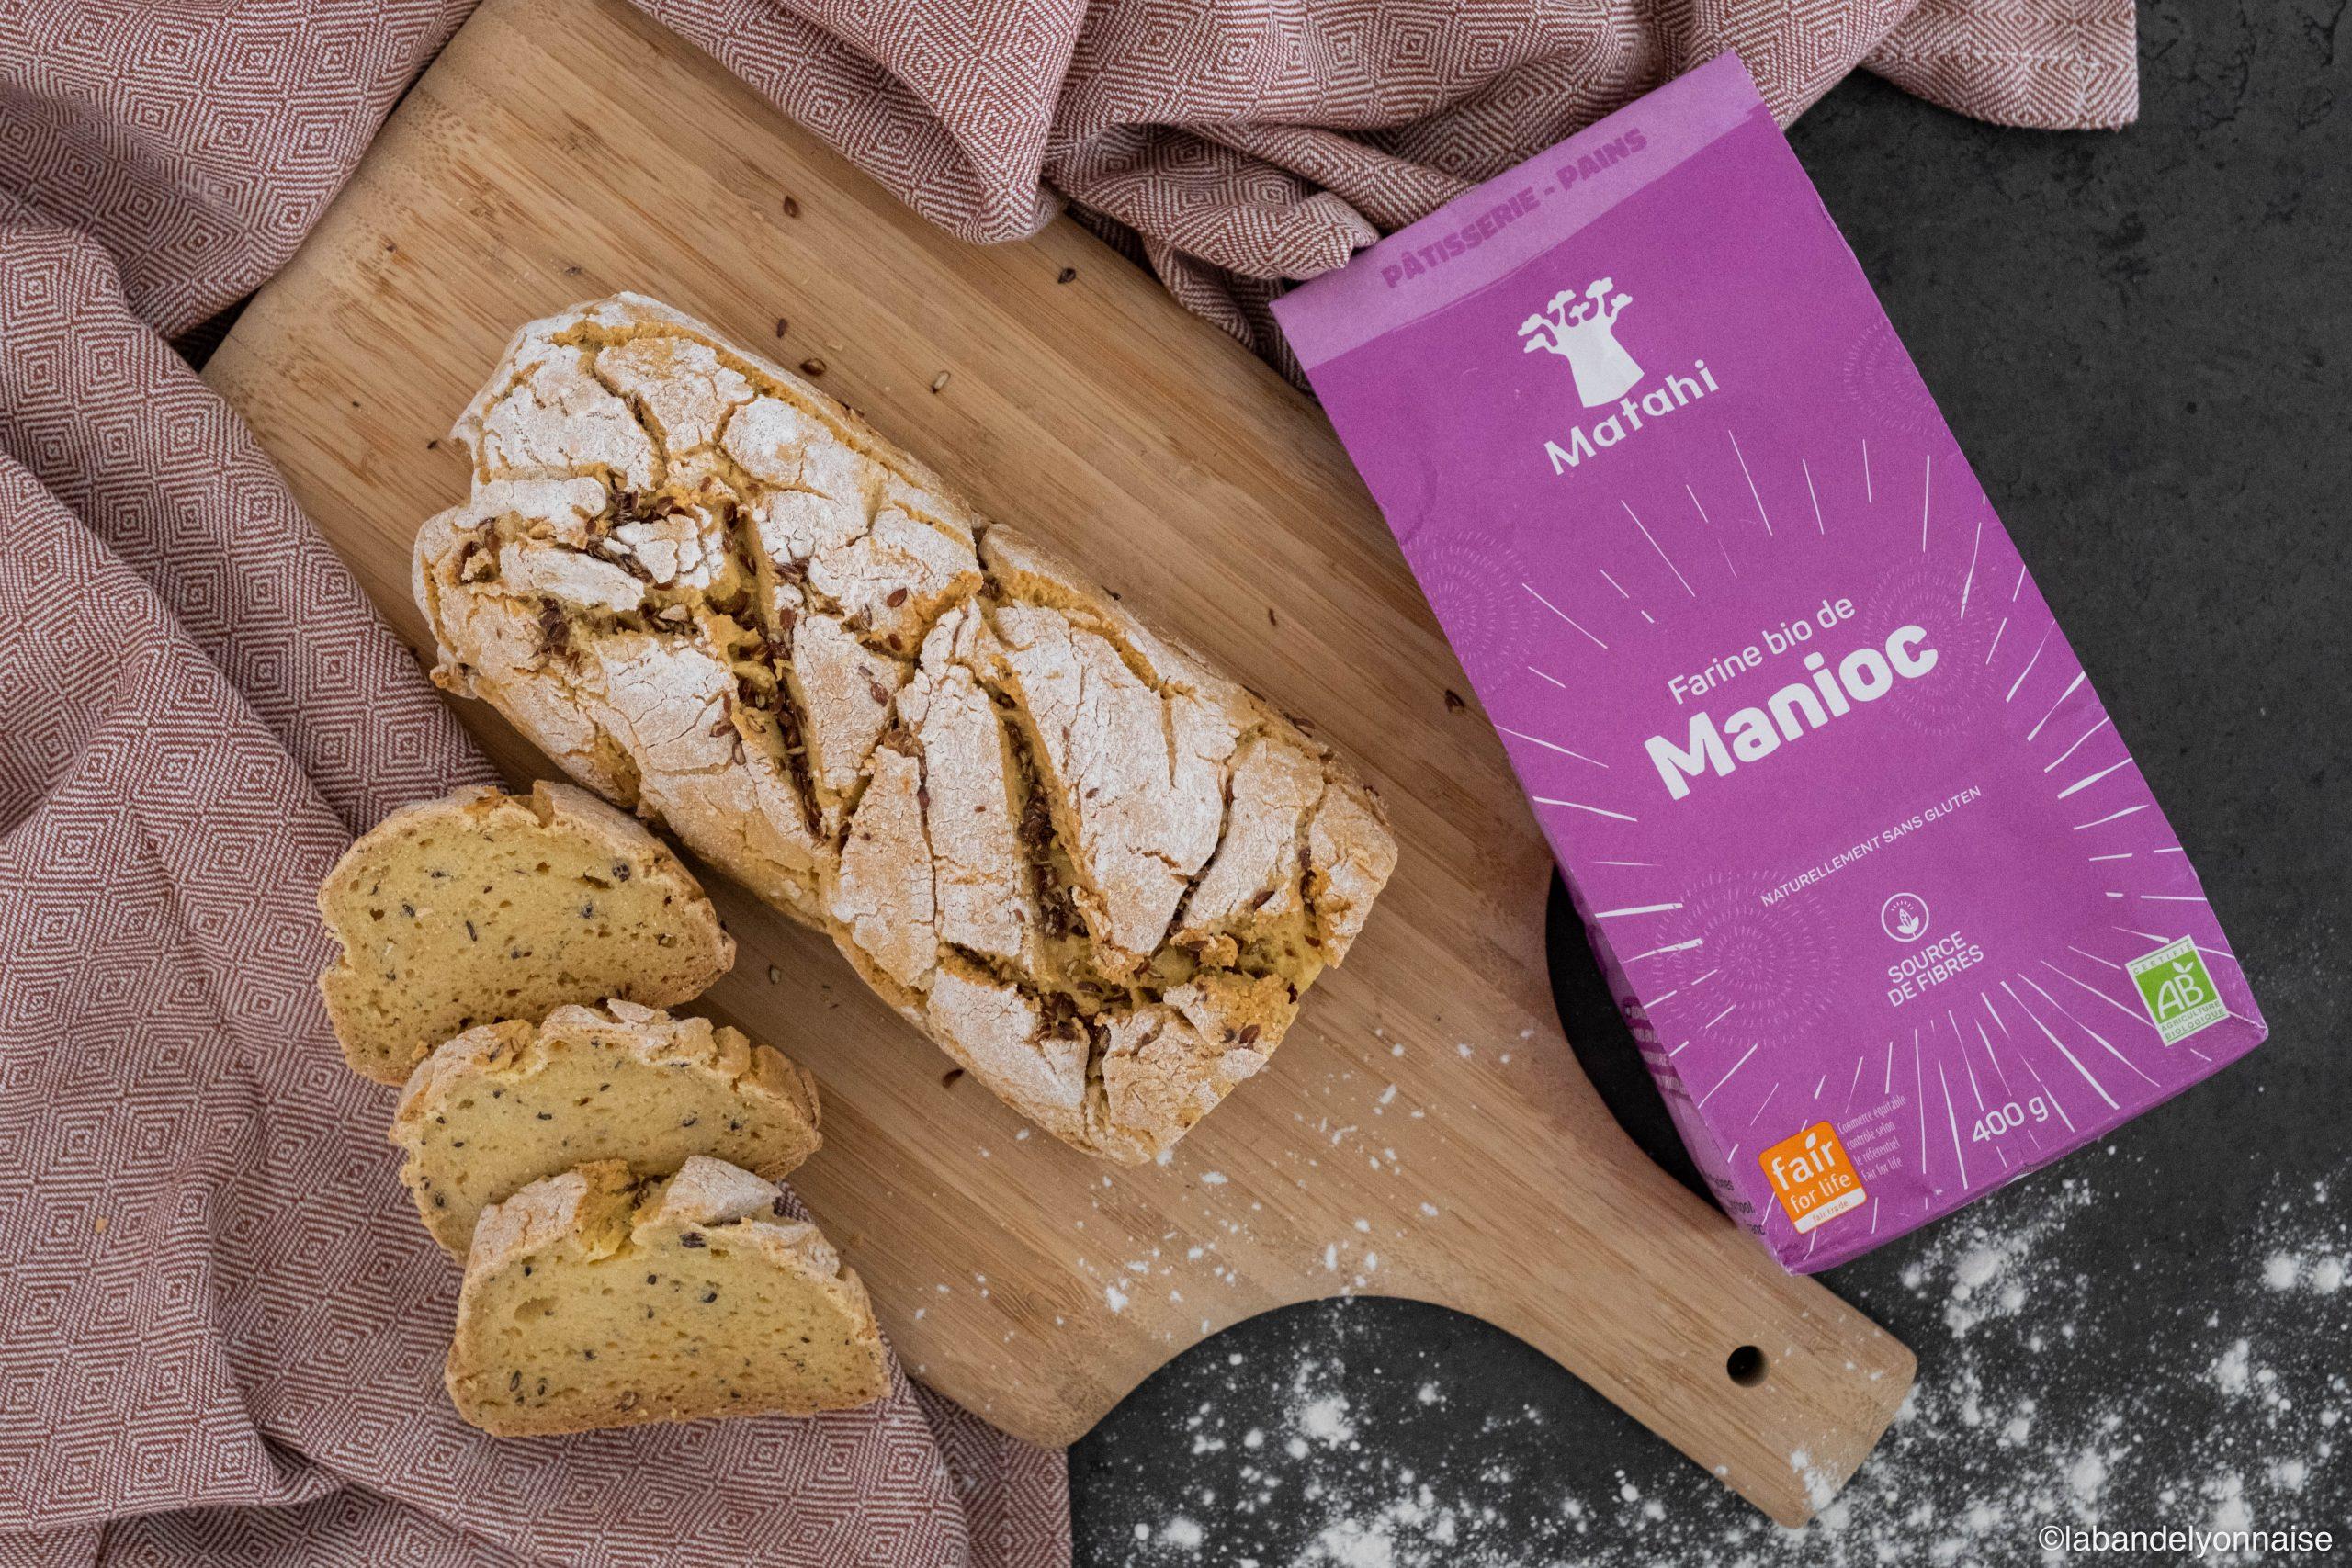 matahi visuel9 ©labandelyonnaise scaled - Farine de manioc MATAHI : une nouvelle farine Bio, sans gluten et équitable